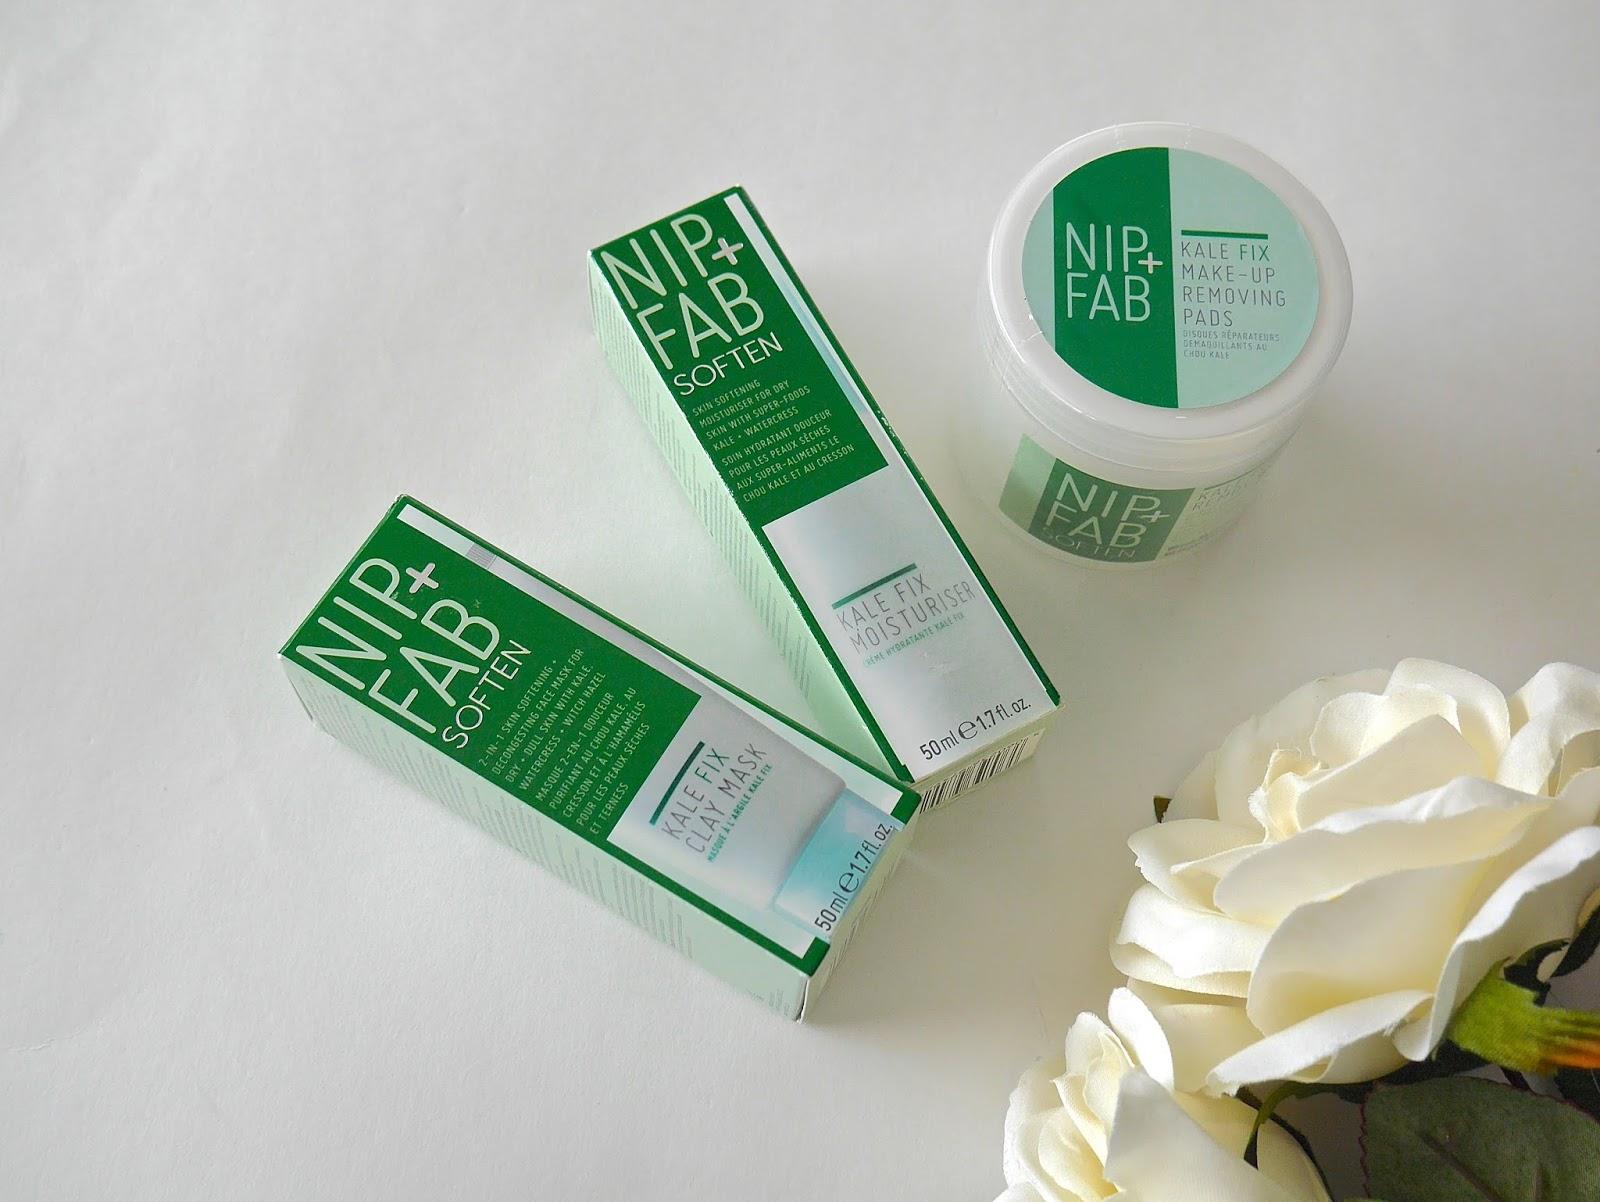 moisturizer, super food, cleansing pads, clay masks, masks, skincare, nip+fab, kale